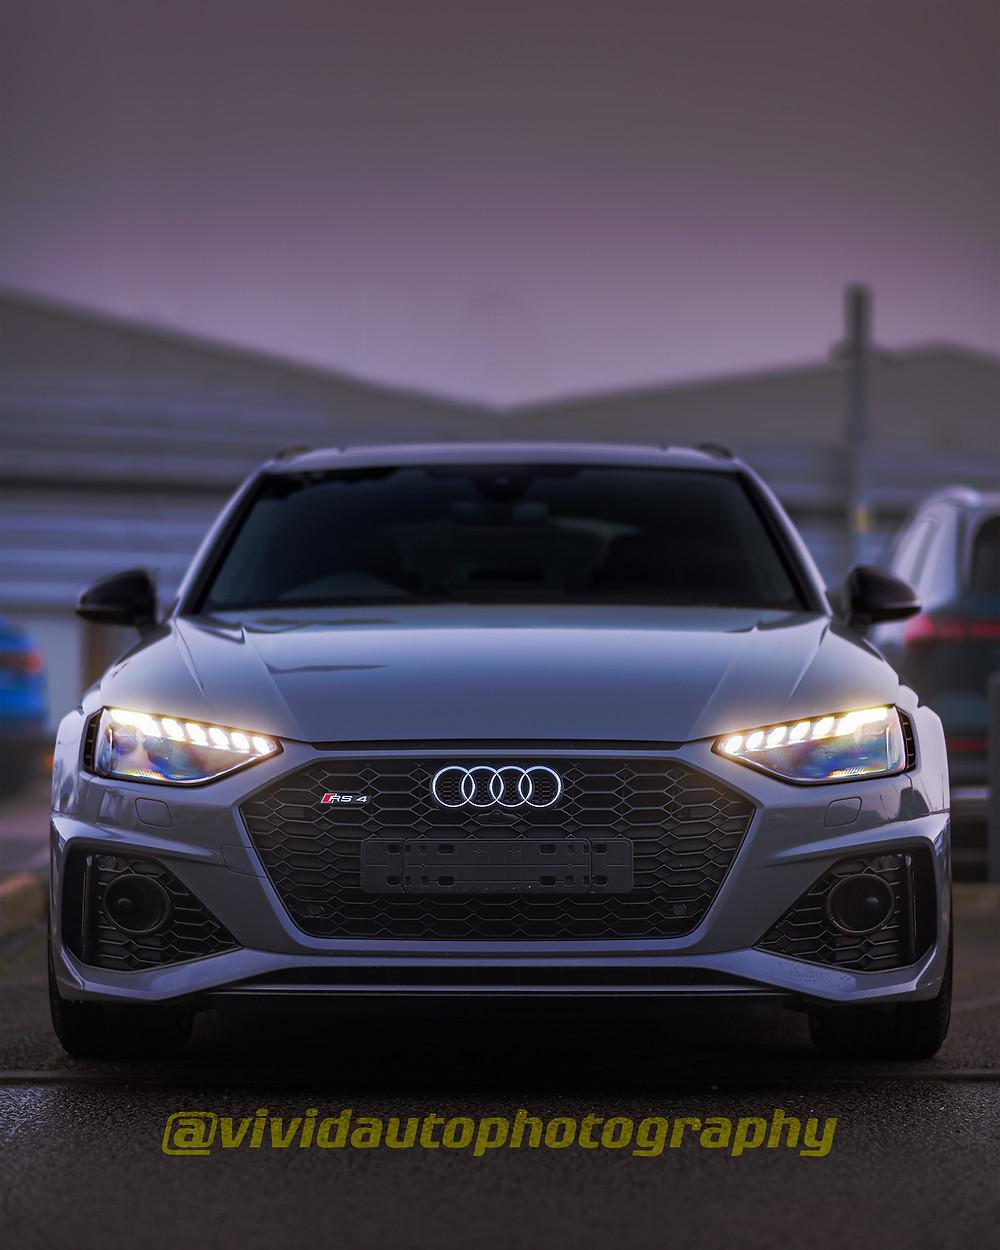 Audi RS4 Avant front poster | Fog